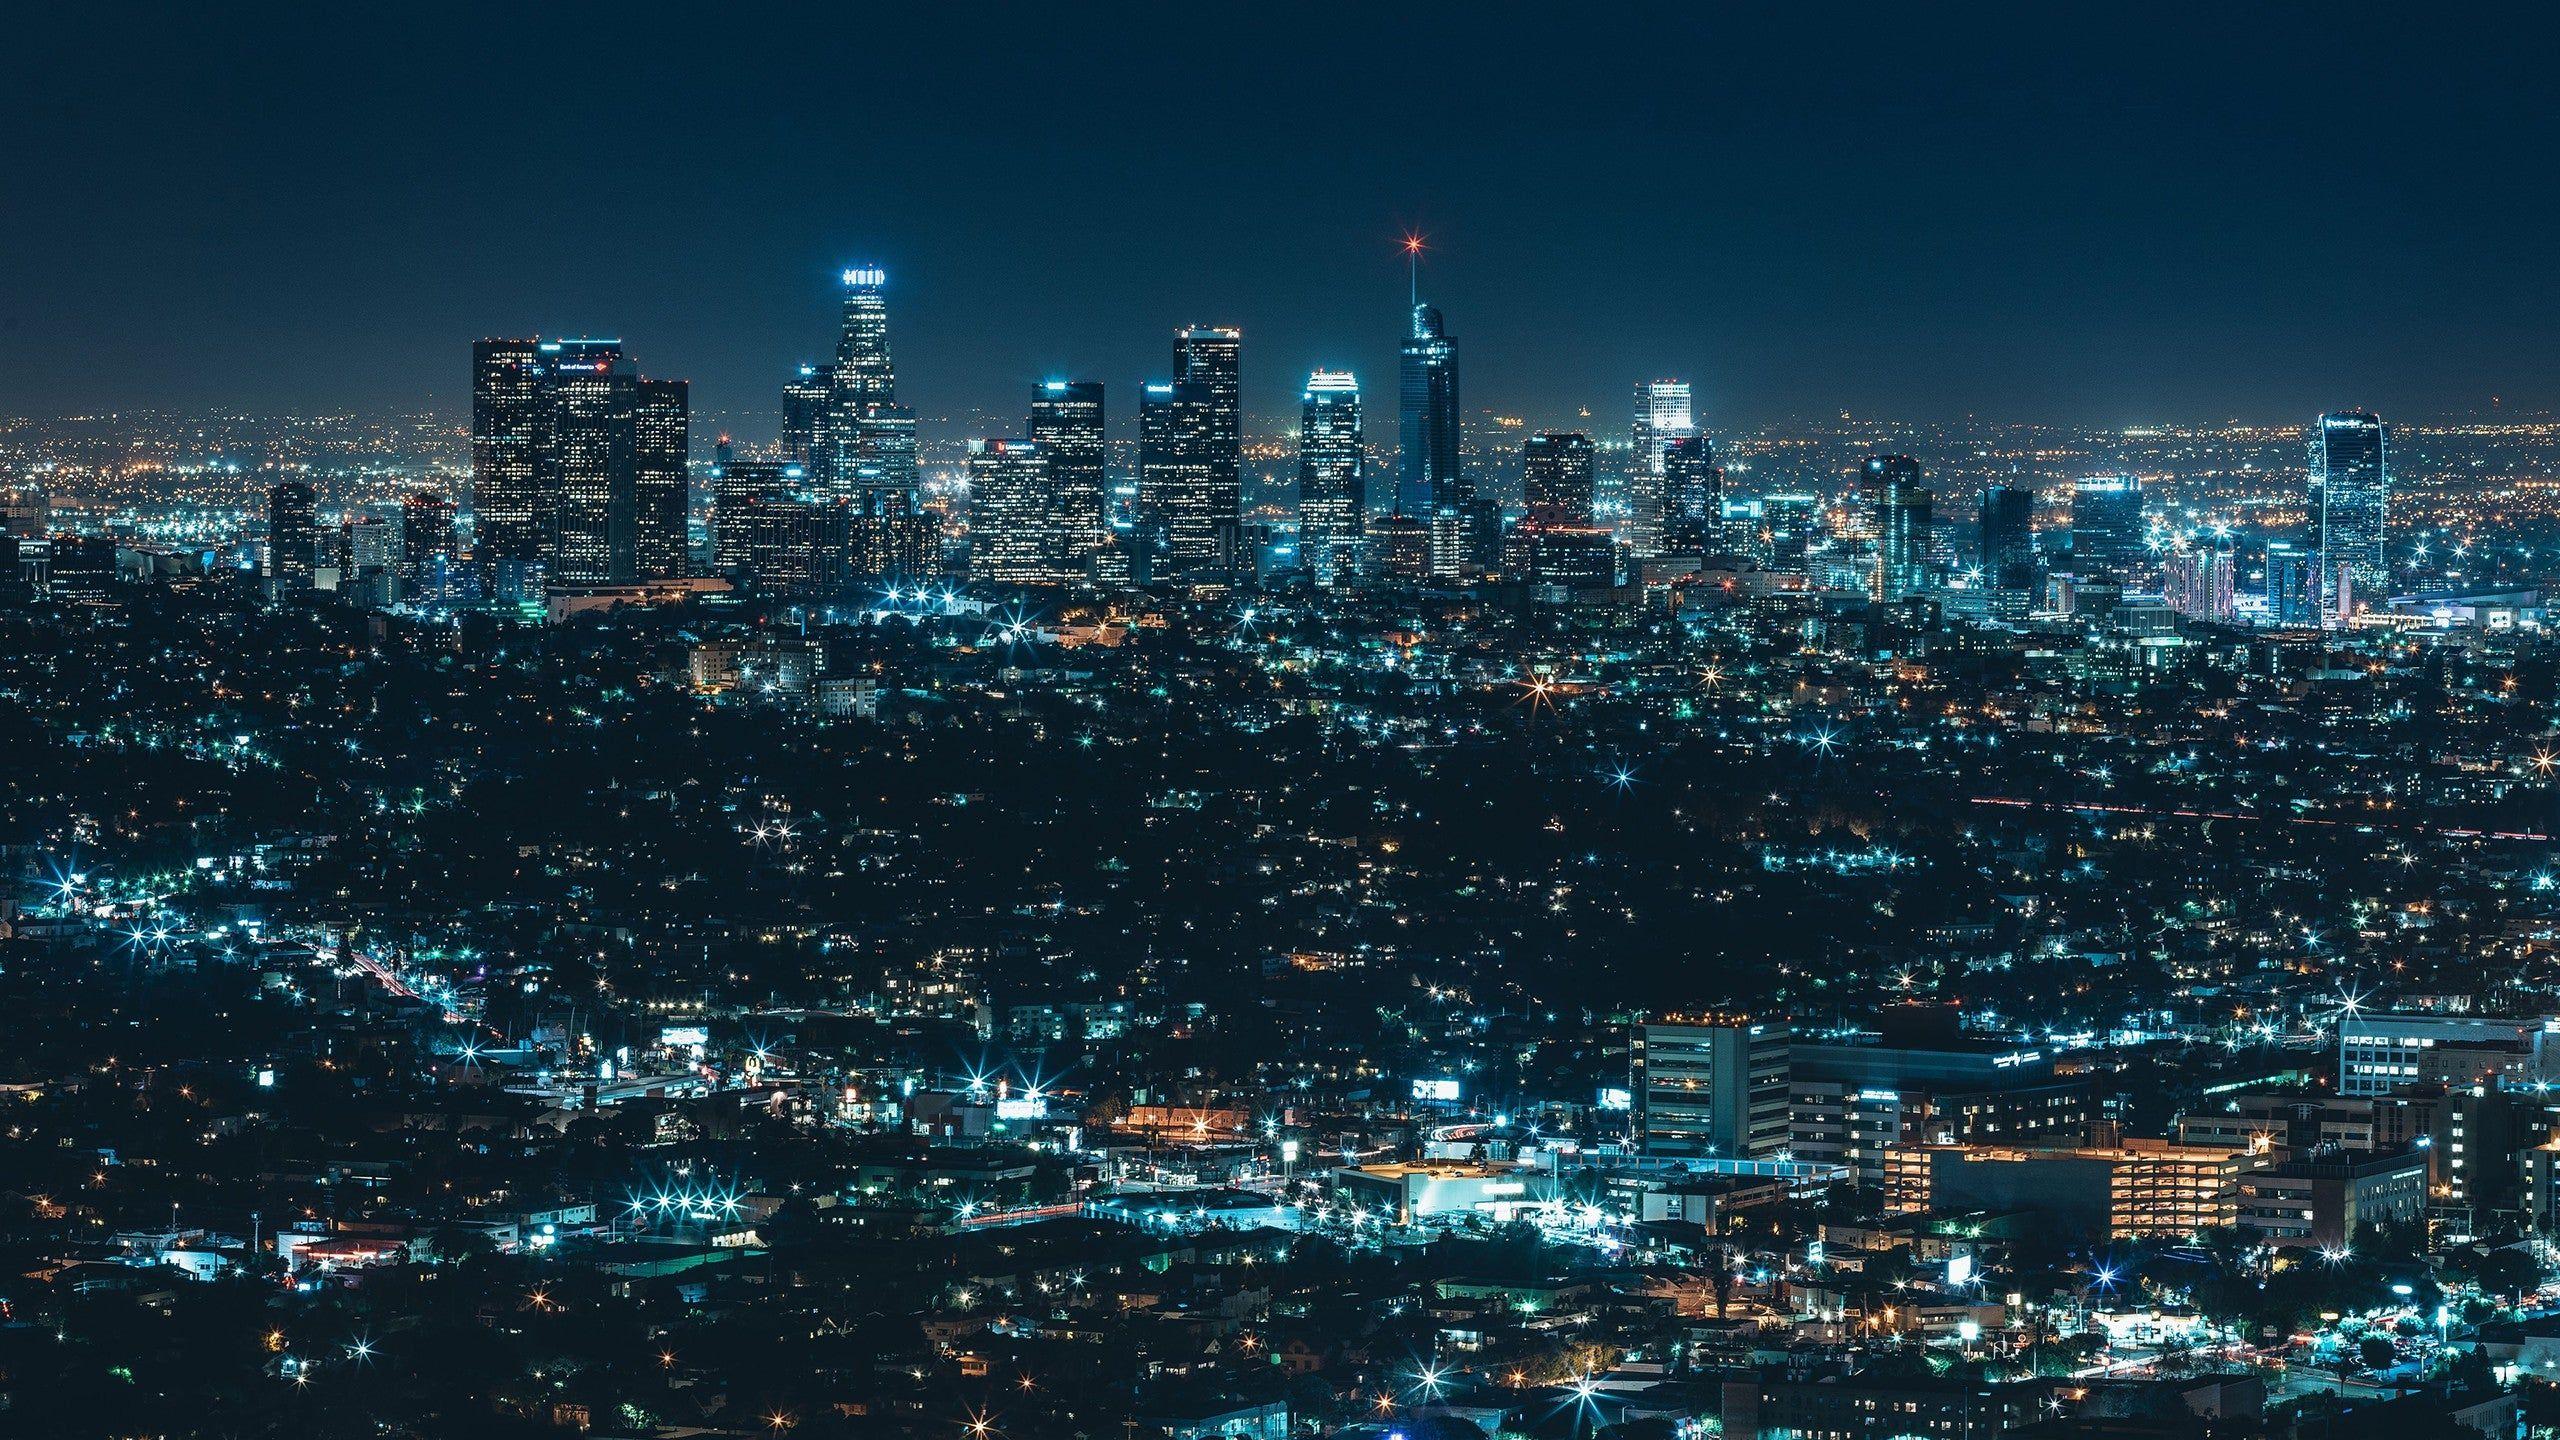 Los Angeles Nightscape Hd Wallpaper 4k Desktop Wallpapers Desktop Wallpapers Backgrounds Nightscape